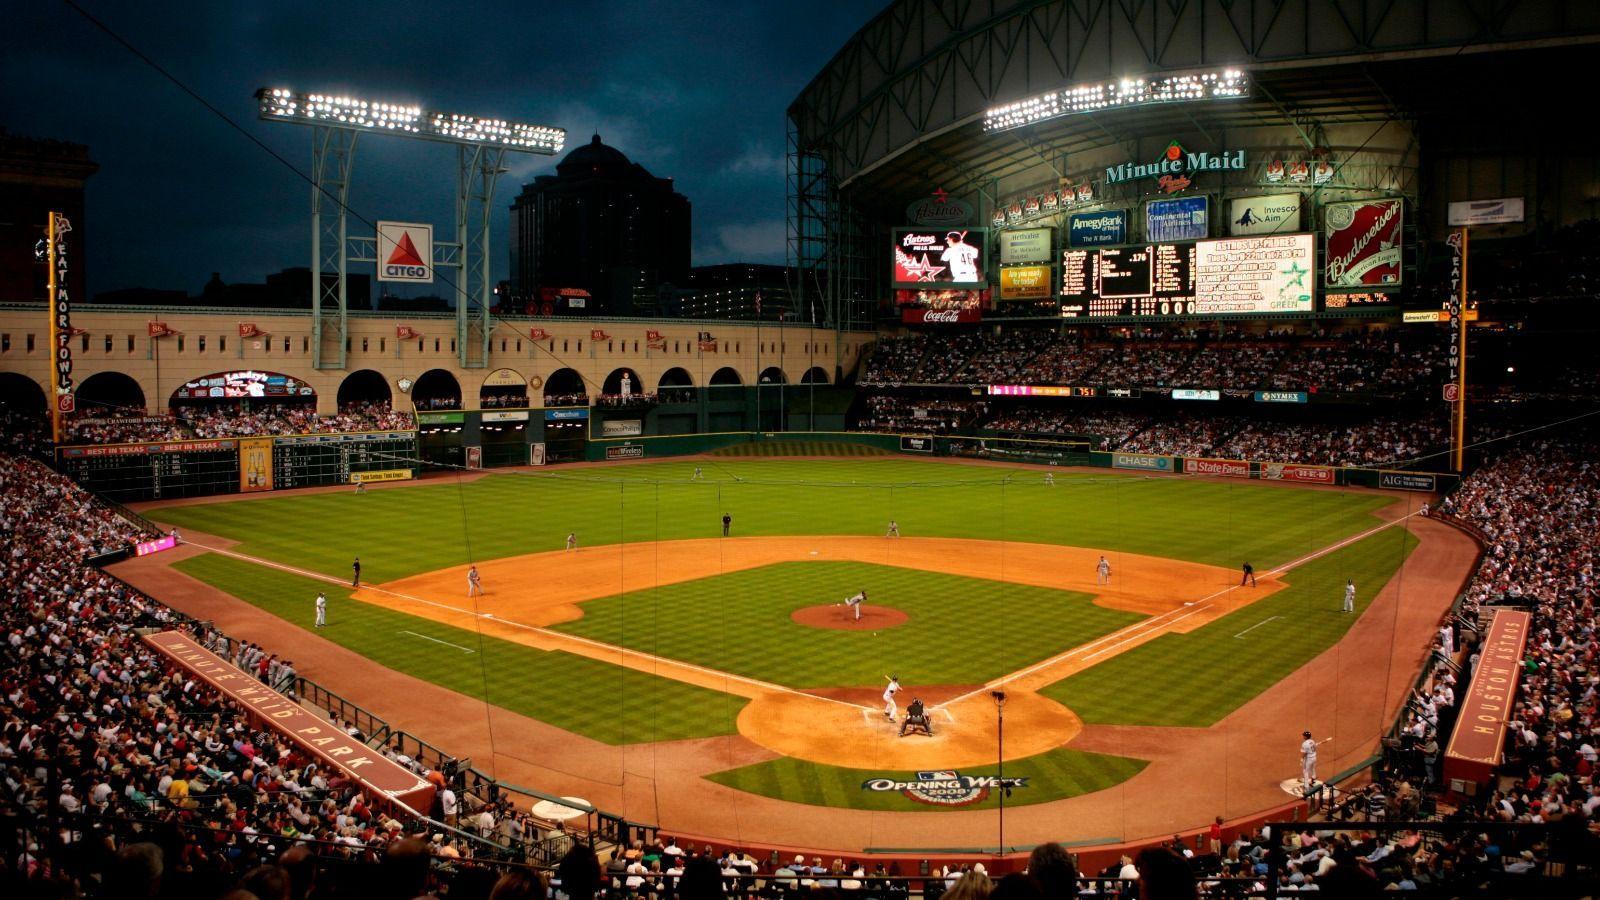 Minute Maid Park Home Of The Houston Astros Ballpark